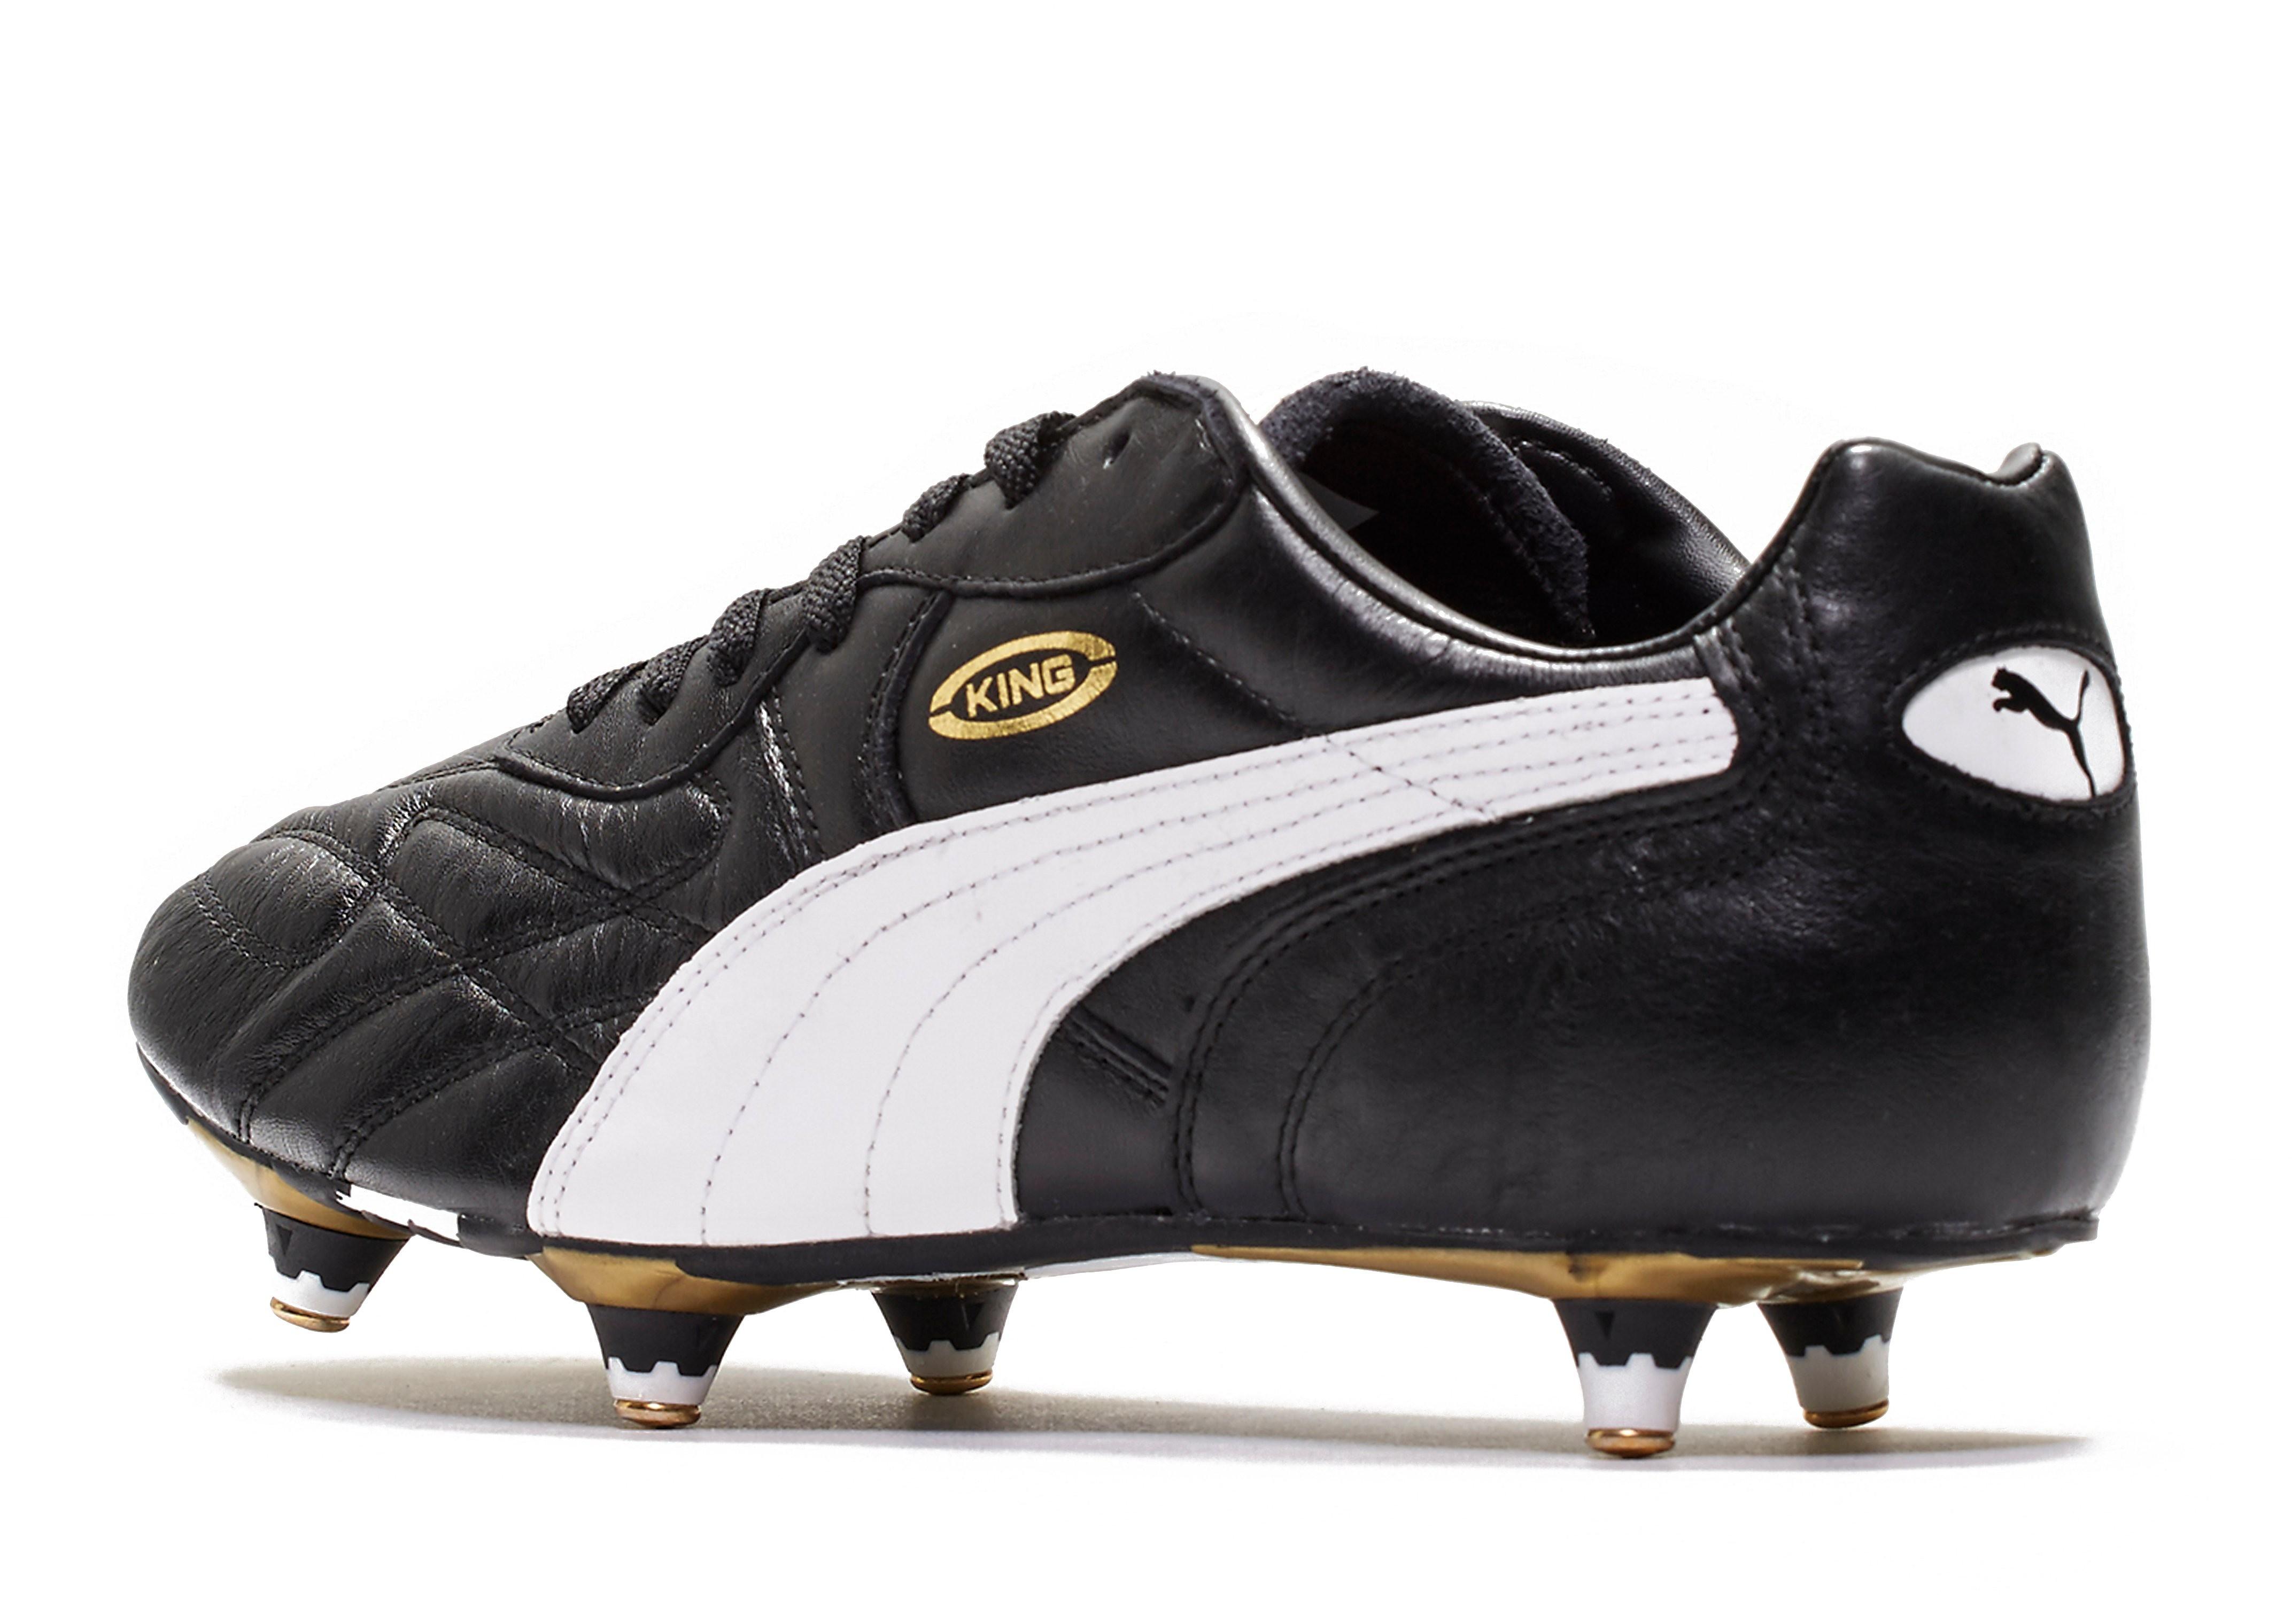 PUMA King Pro Football Boots